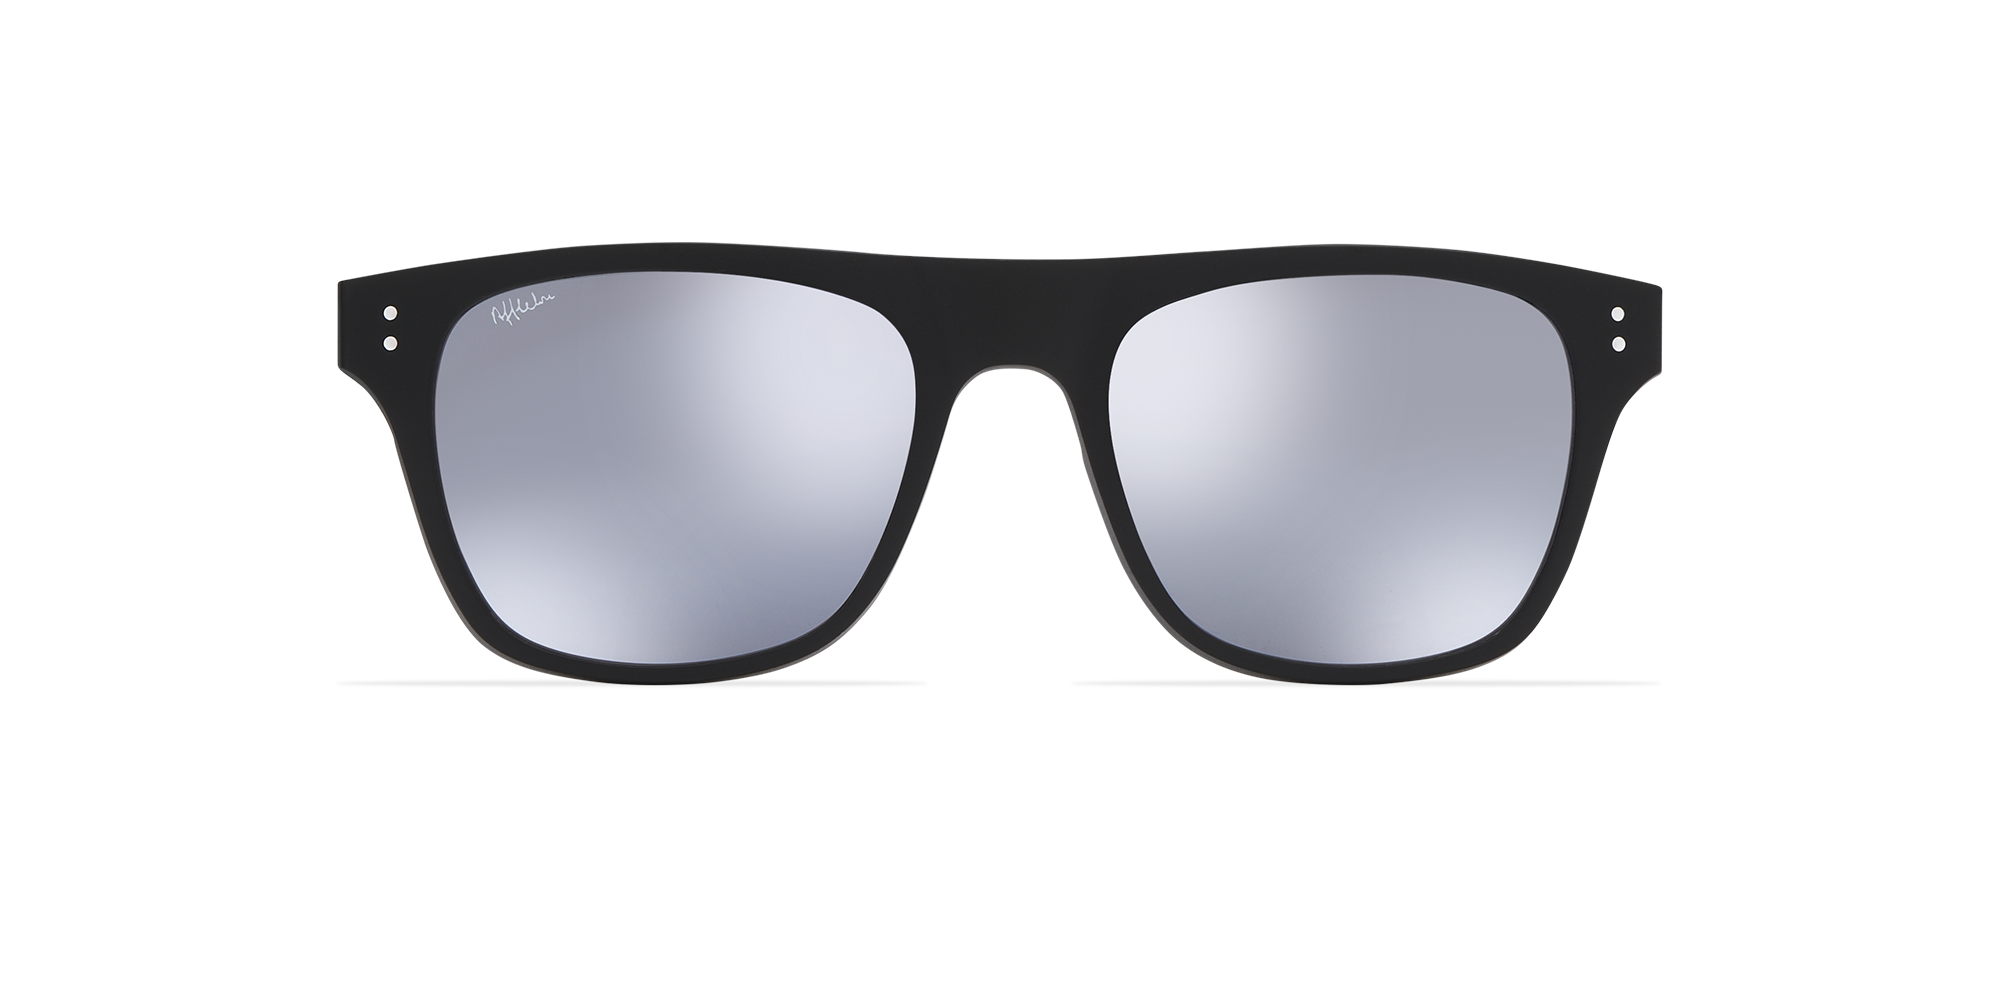 afflelou/france/products/smart_clip/clips_glasses/TMK34XLBK015021.png